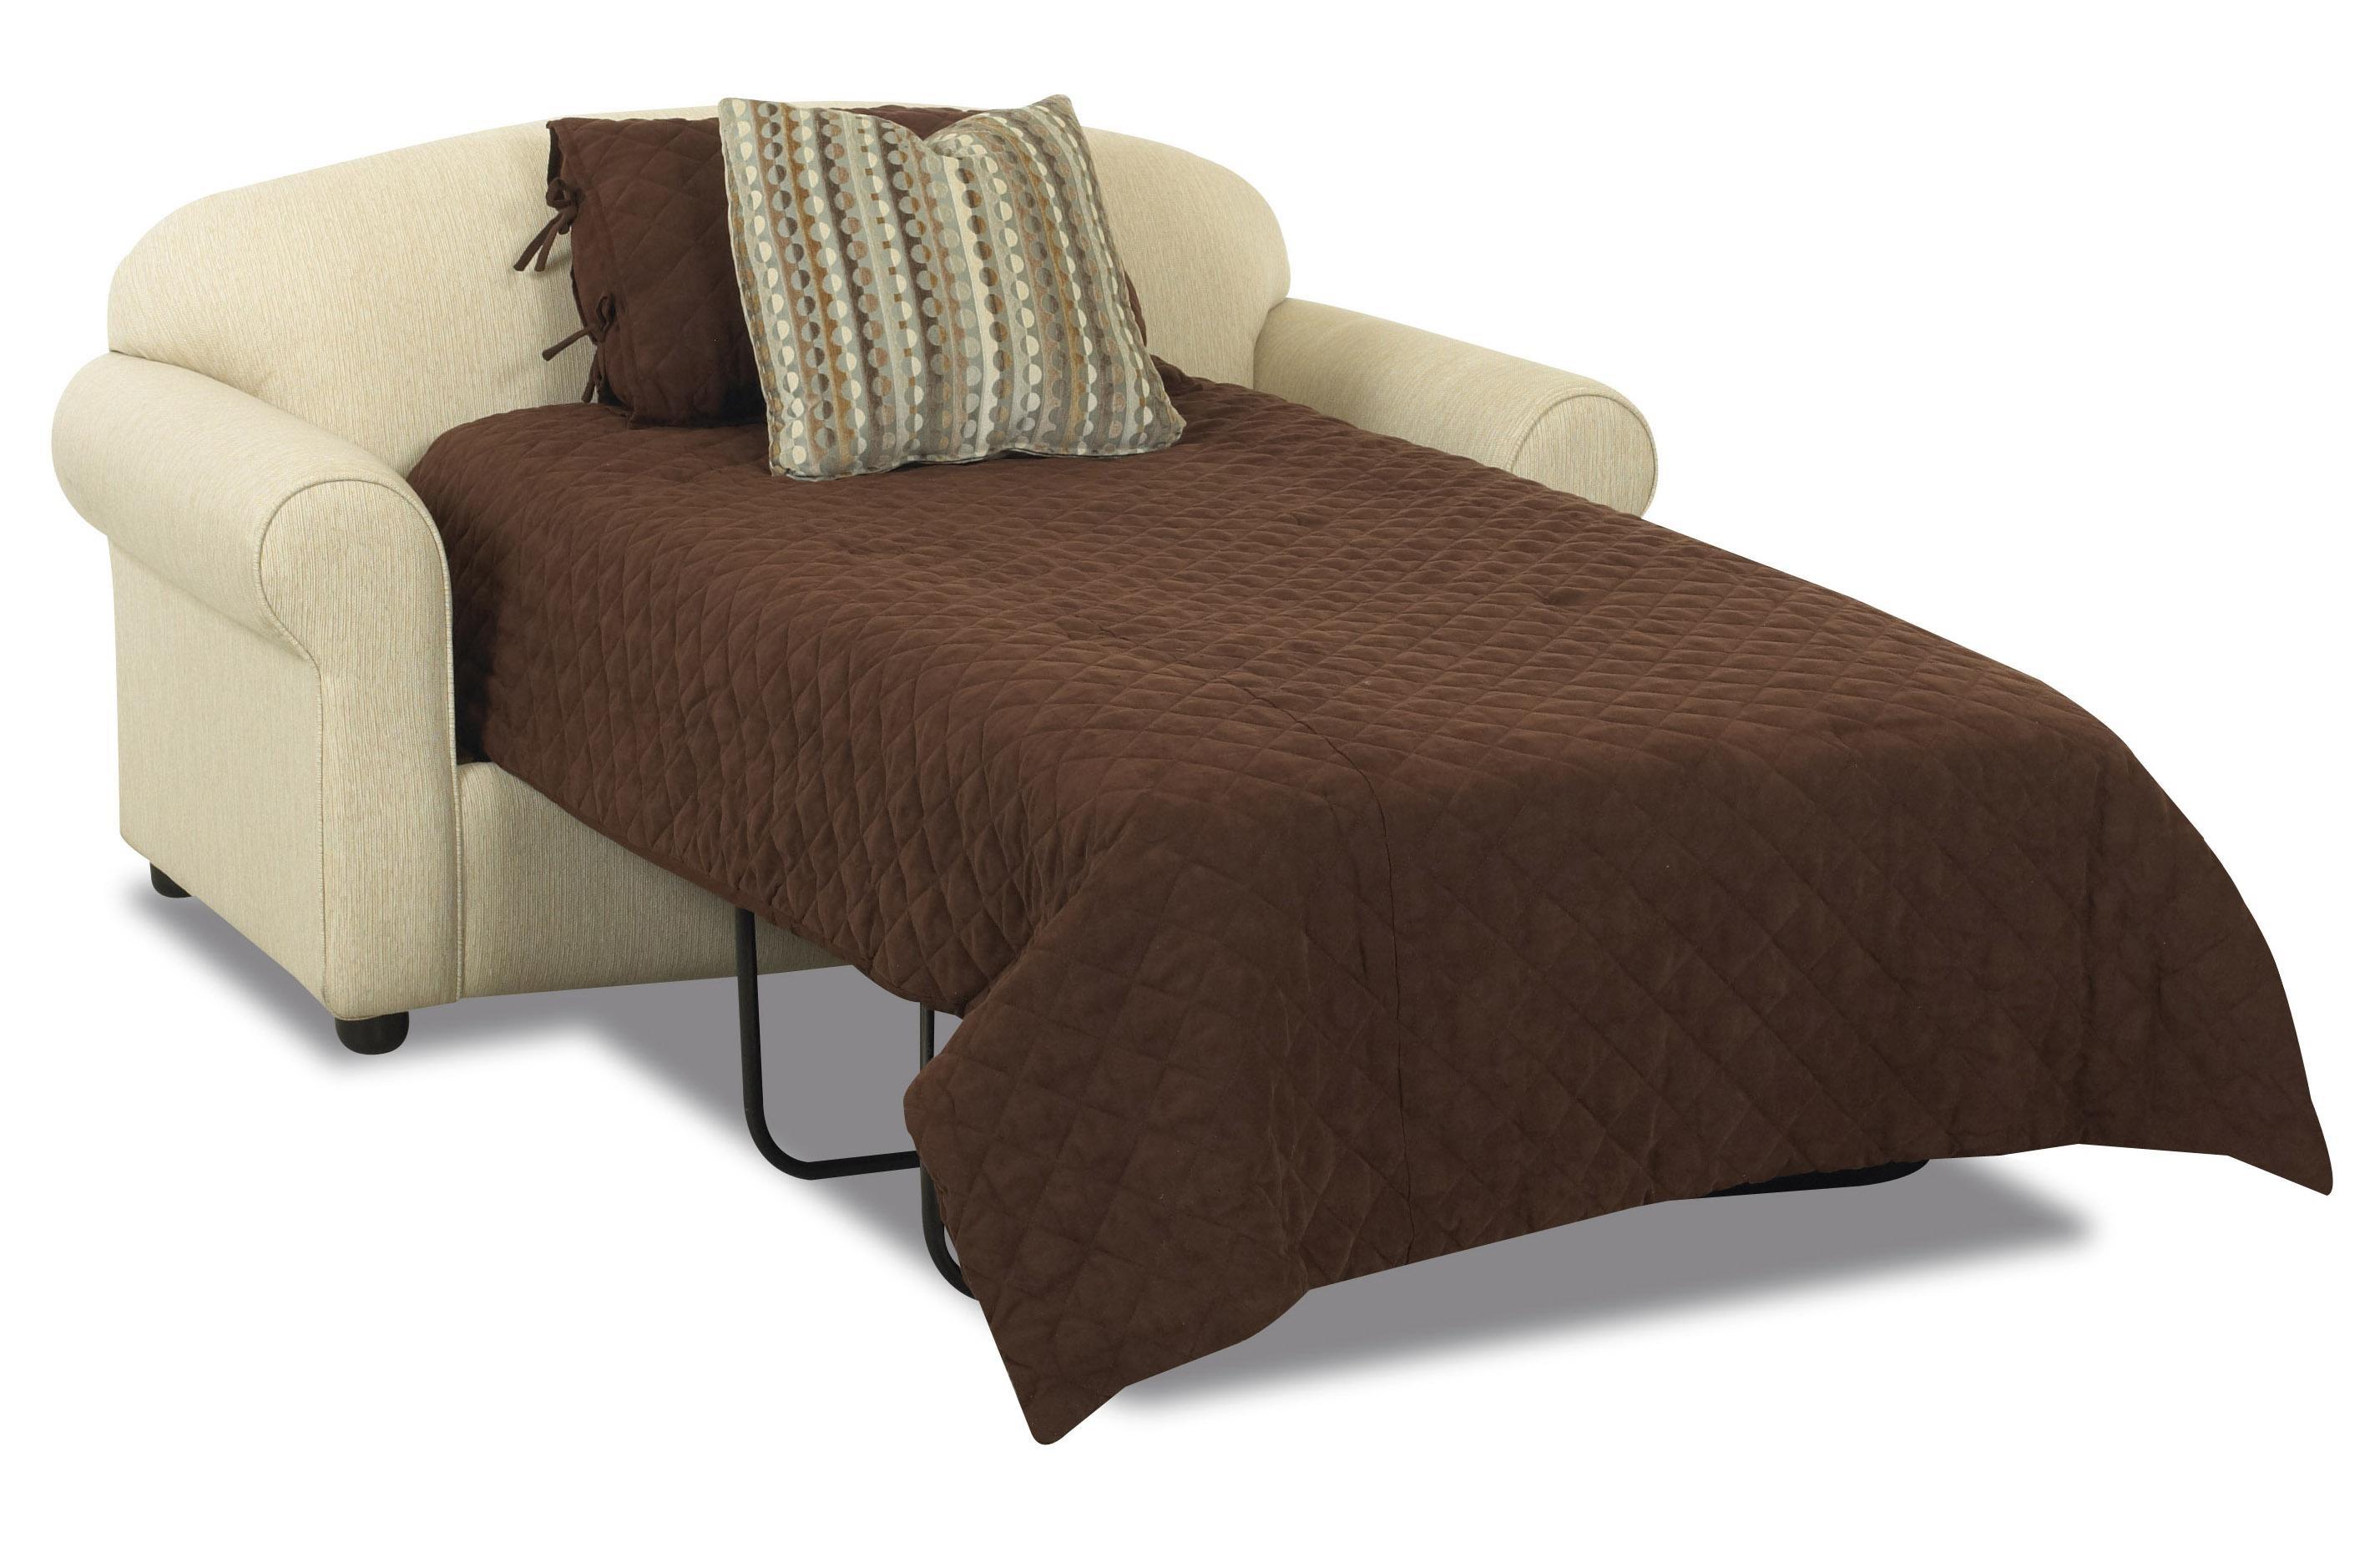 Twin Sleeper Sofa klaussner possibilitiestwin sleeper sofa ... FVCTRCL